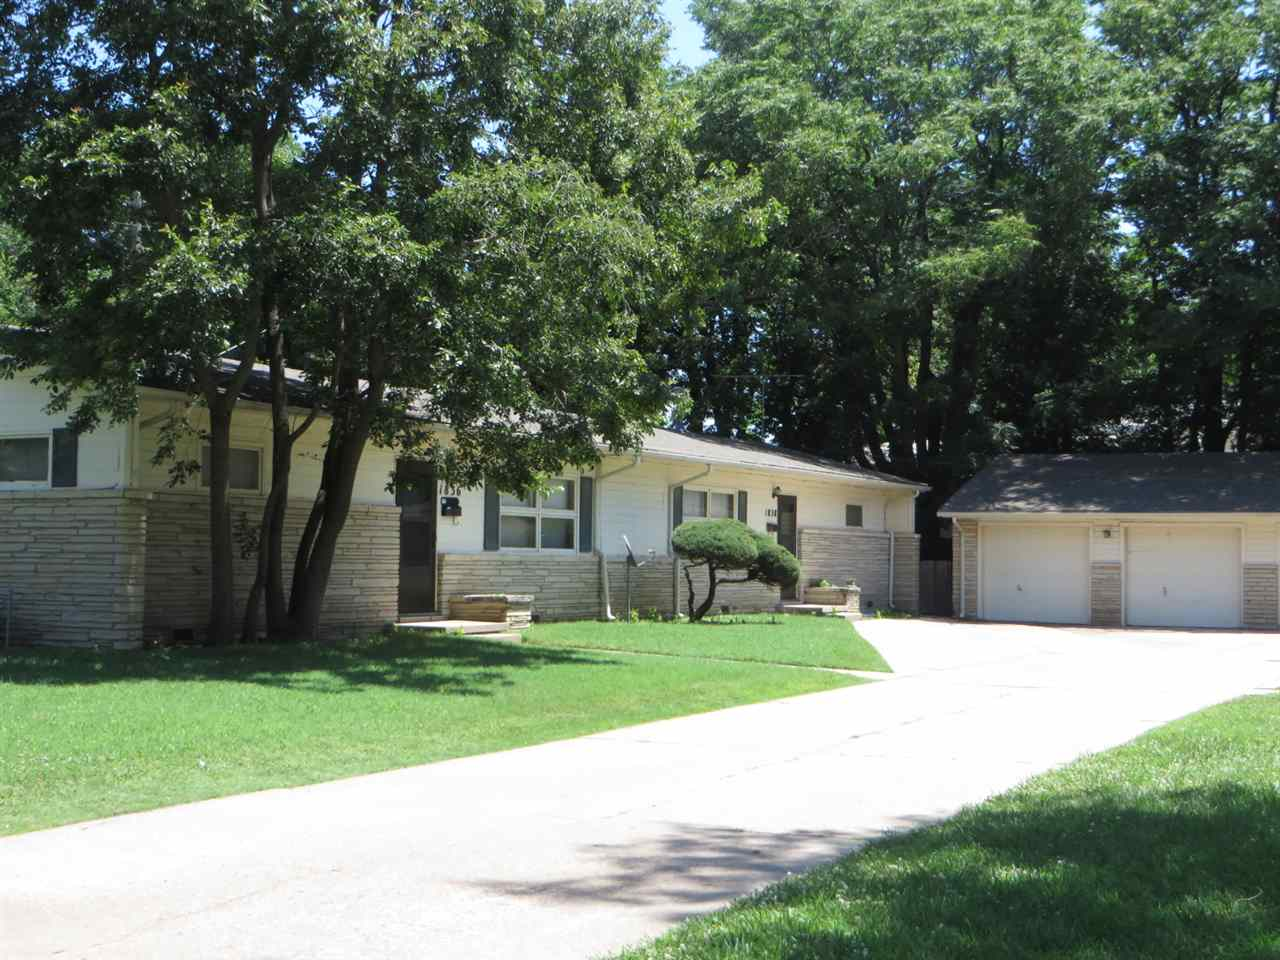 1836 S Lorraine Ave, Wichita, KS 67211